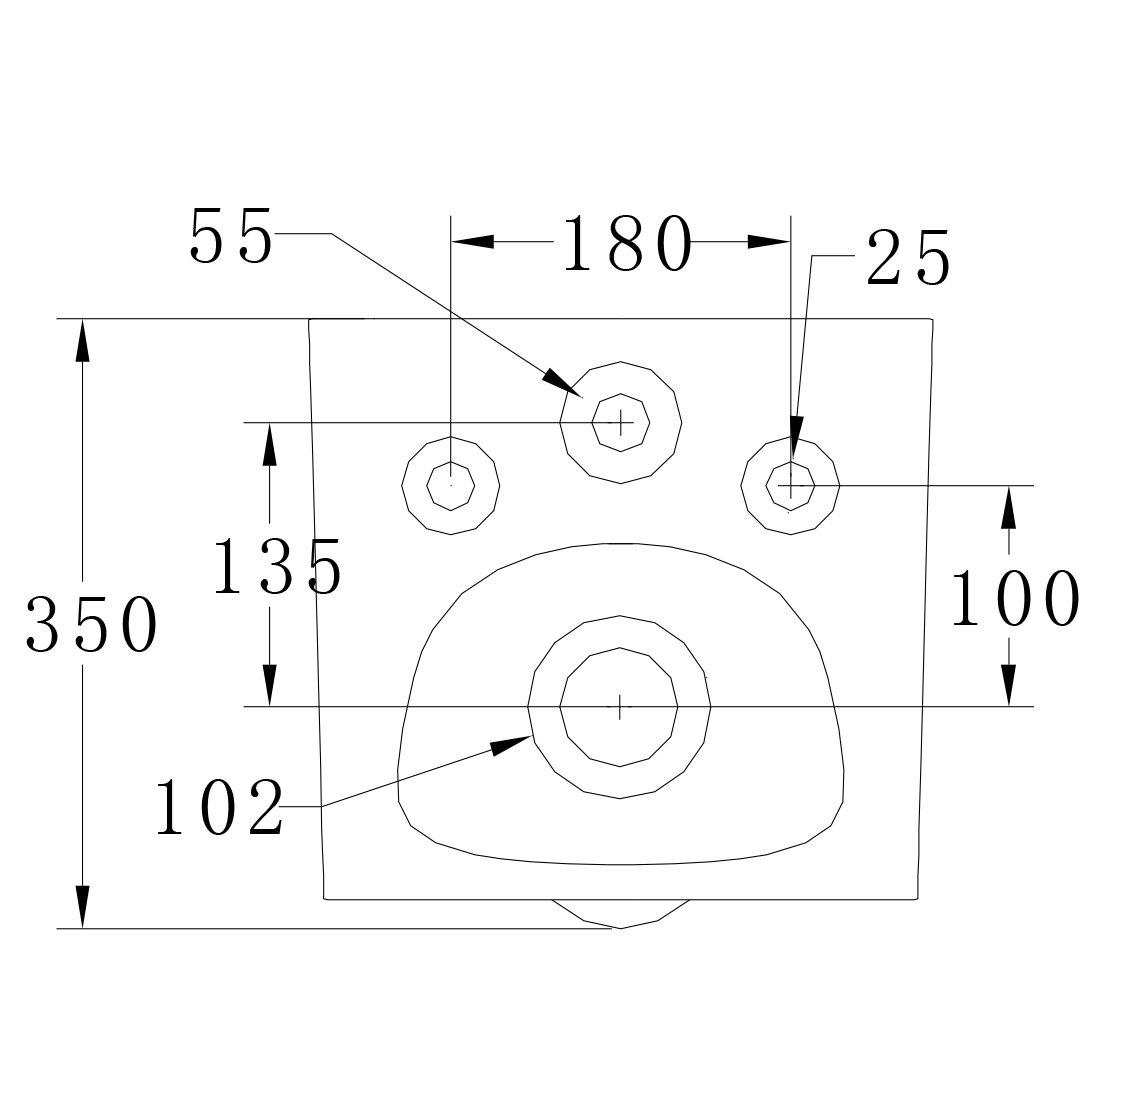 Spülrandloses Wand-Hänge WC B-8030R Weiß - mit Nano-Beschichtung - inkl. Softclose-Deckel zoom thumbnail 6